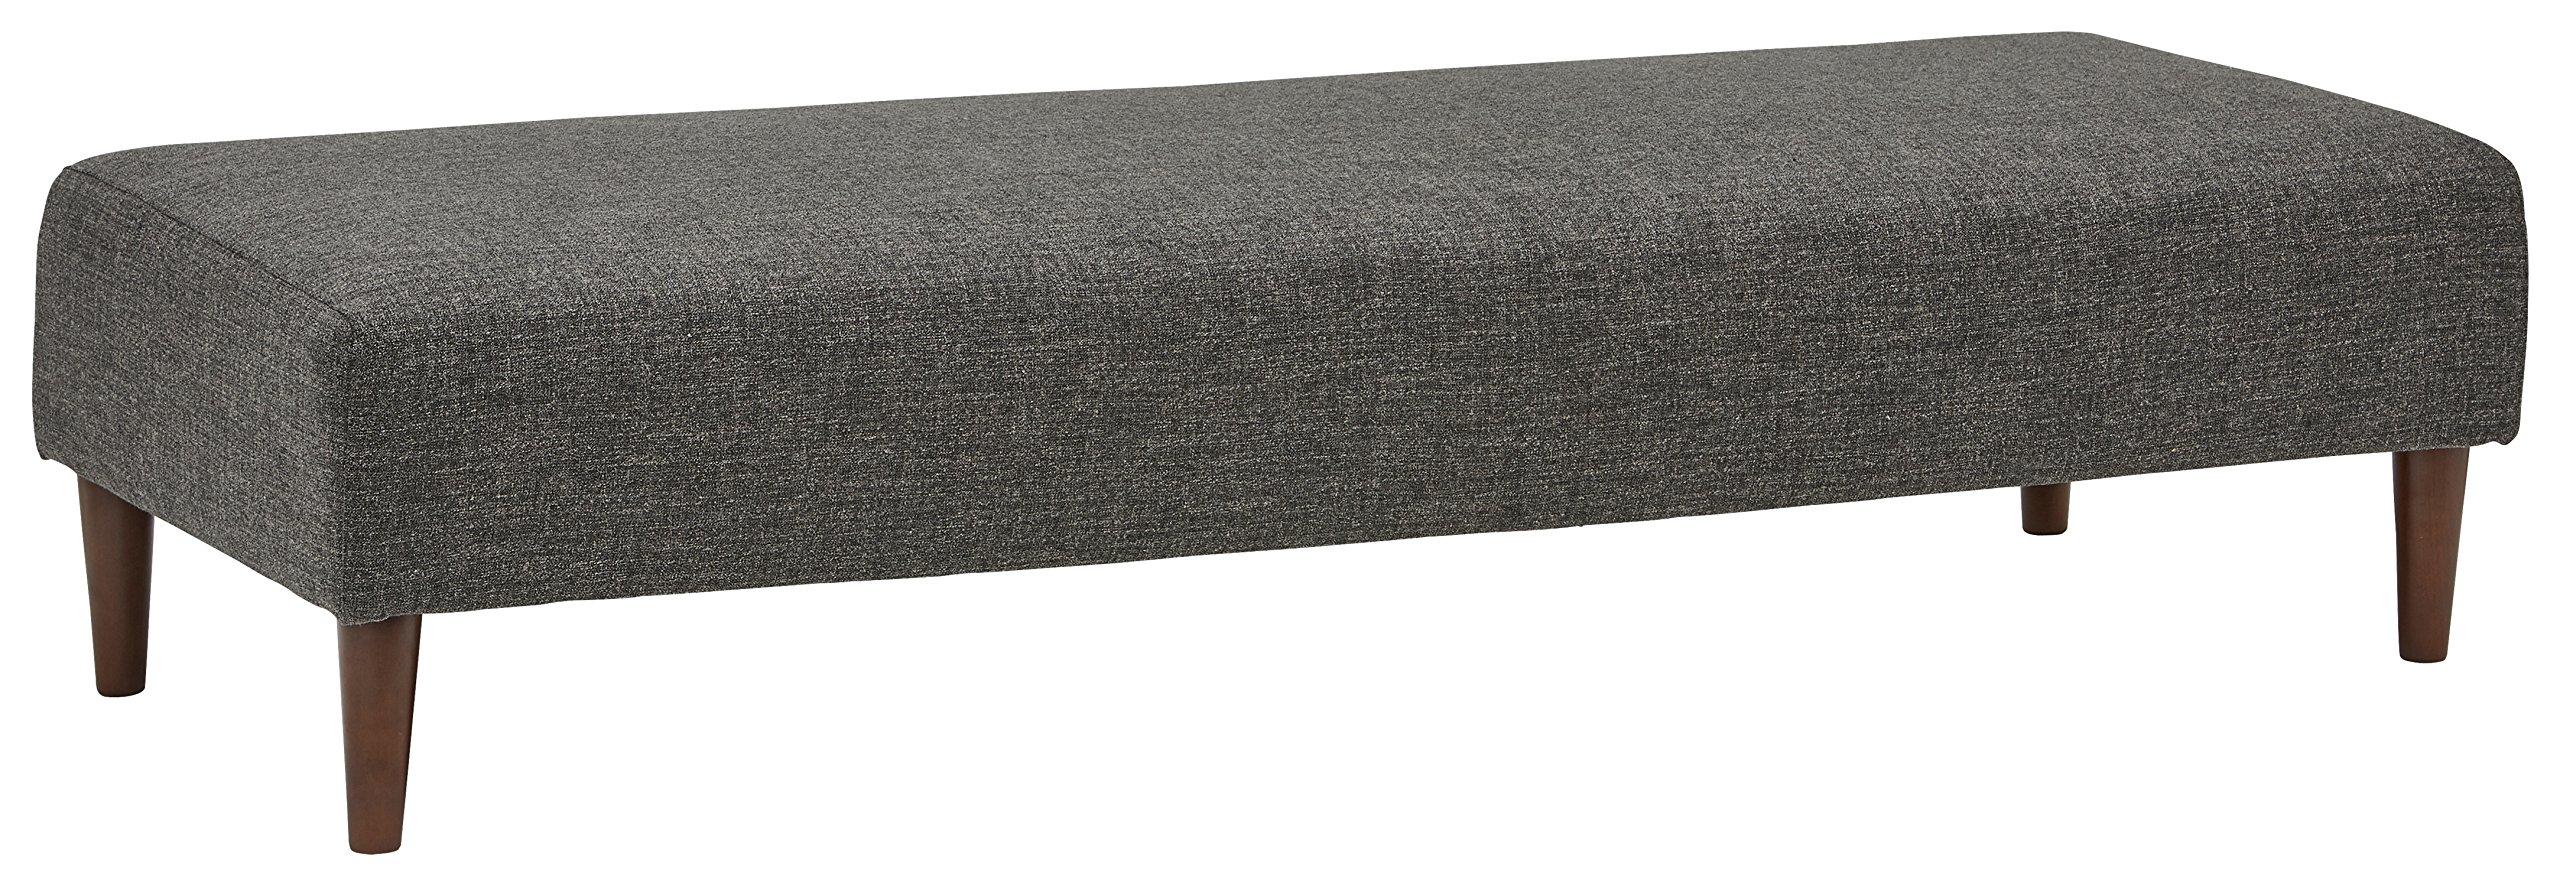 Rivet Ava Mid-Century Ottoman Bench, 63''W, Dark Grey